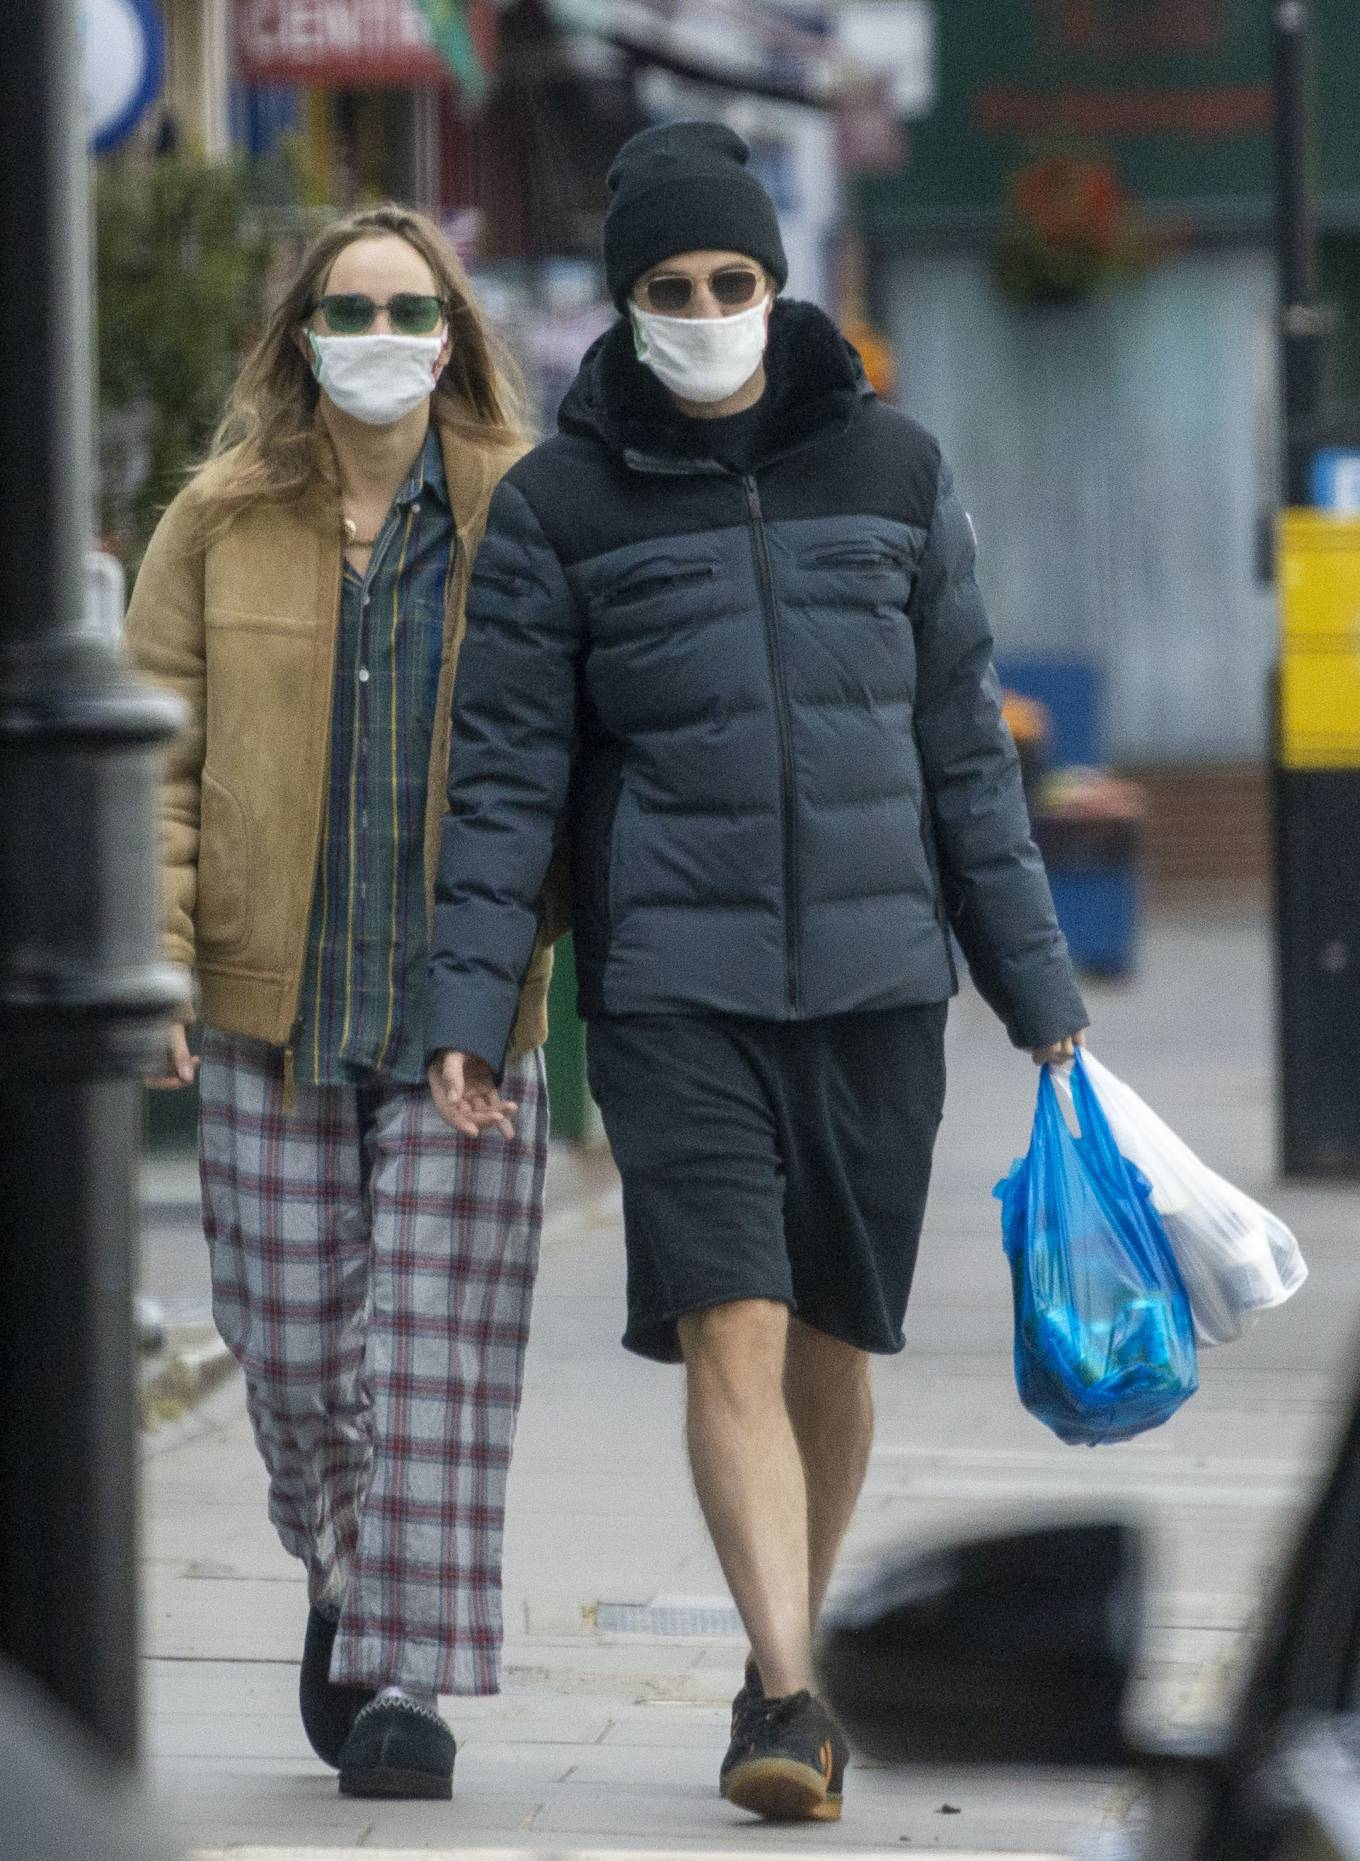 Suki Waterhouse 2020 : Suki Waterhouse and Robert Pattinson – Wearing matching face masks in London-09